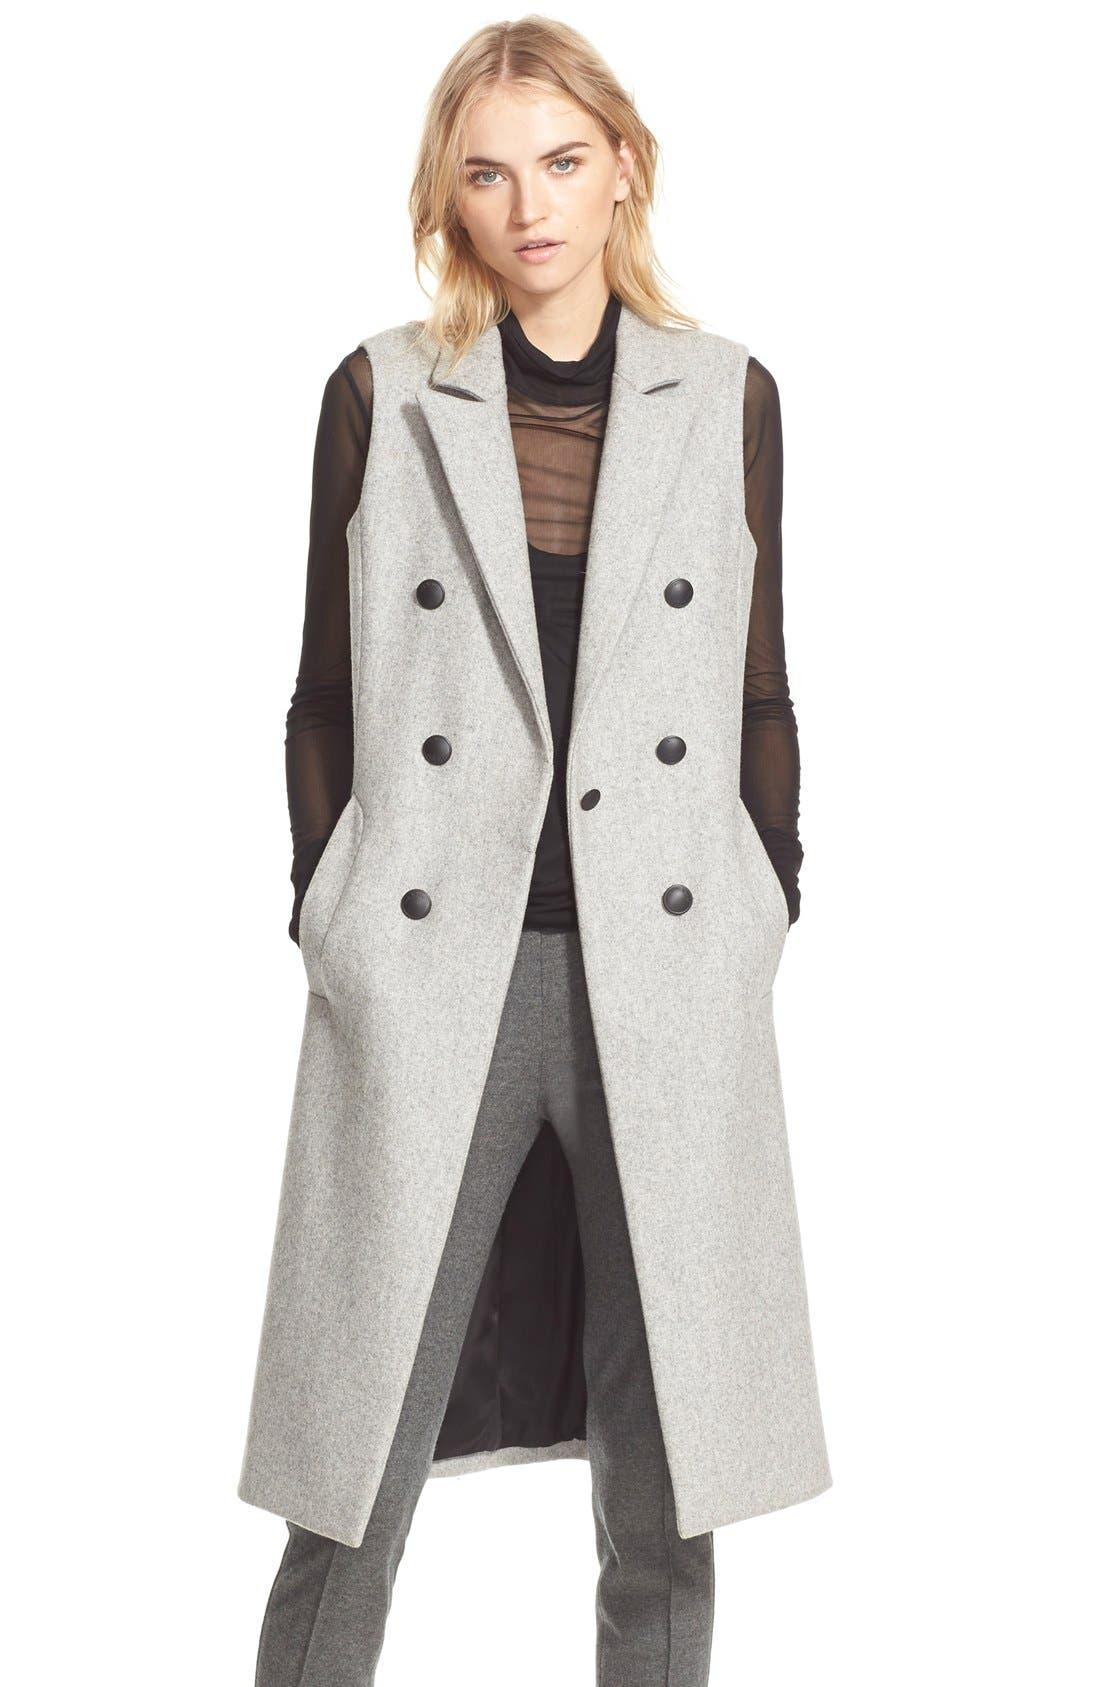 Main Image - rag & bone 'Faye' Long Double Breasted Wool Blend Vest